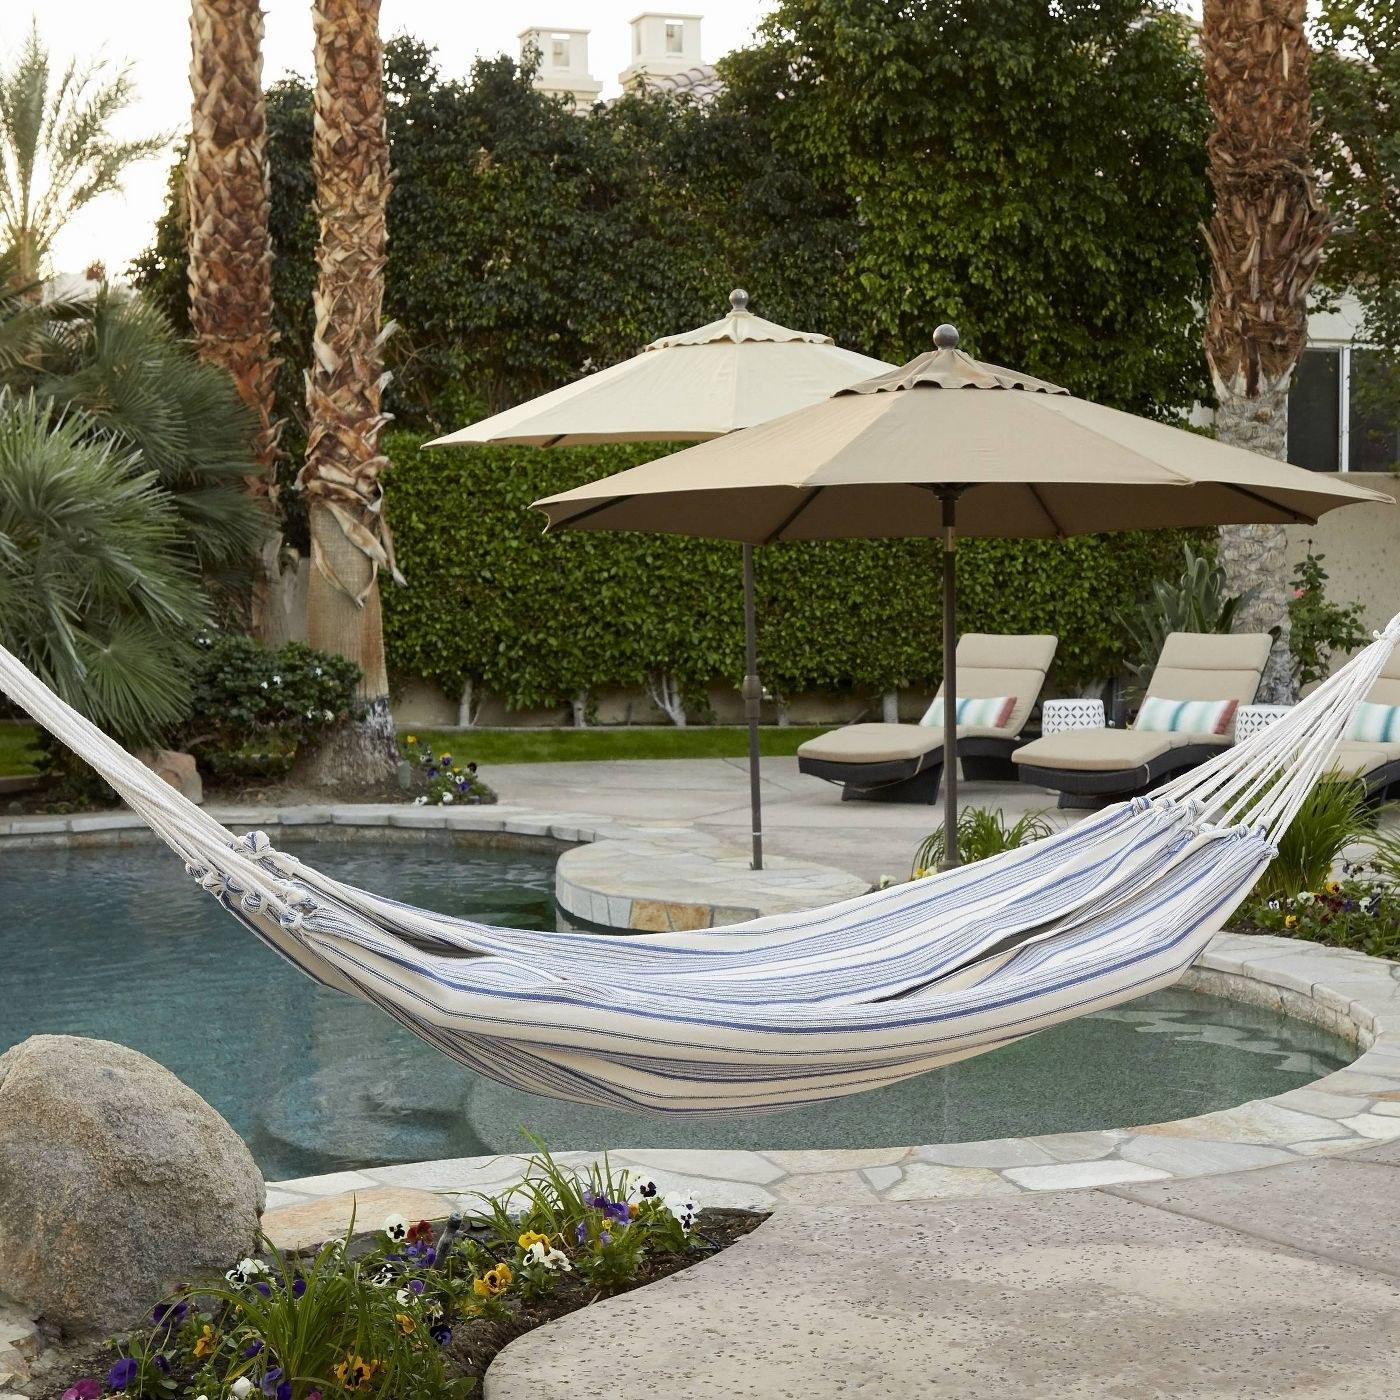 Striped flat-weave hammock above a circular pool in a backyard